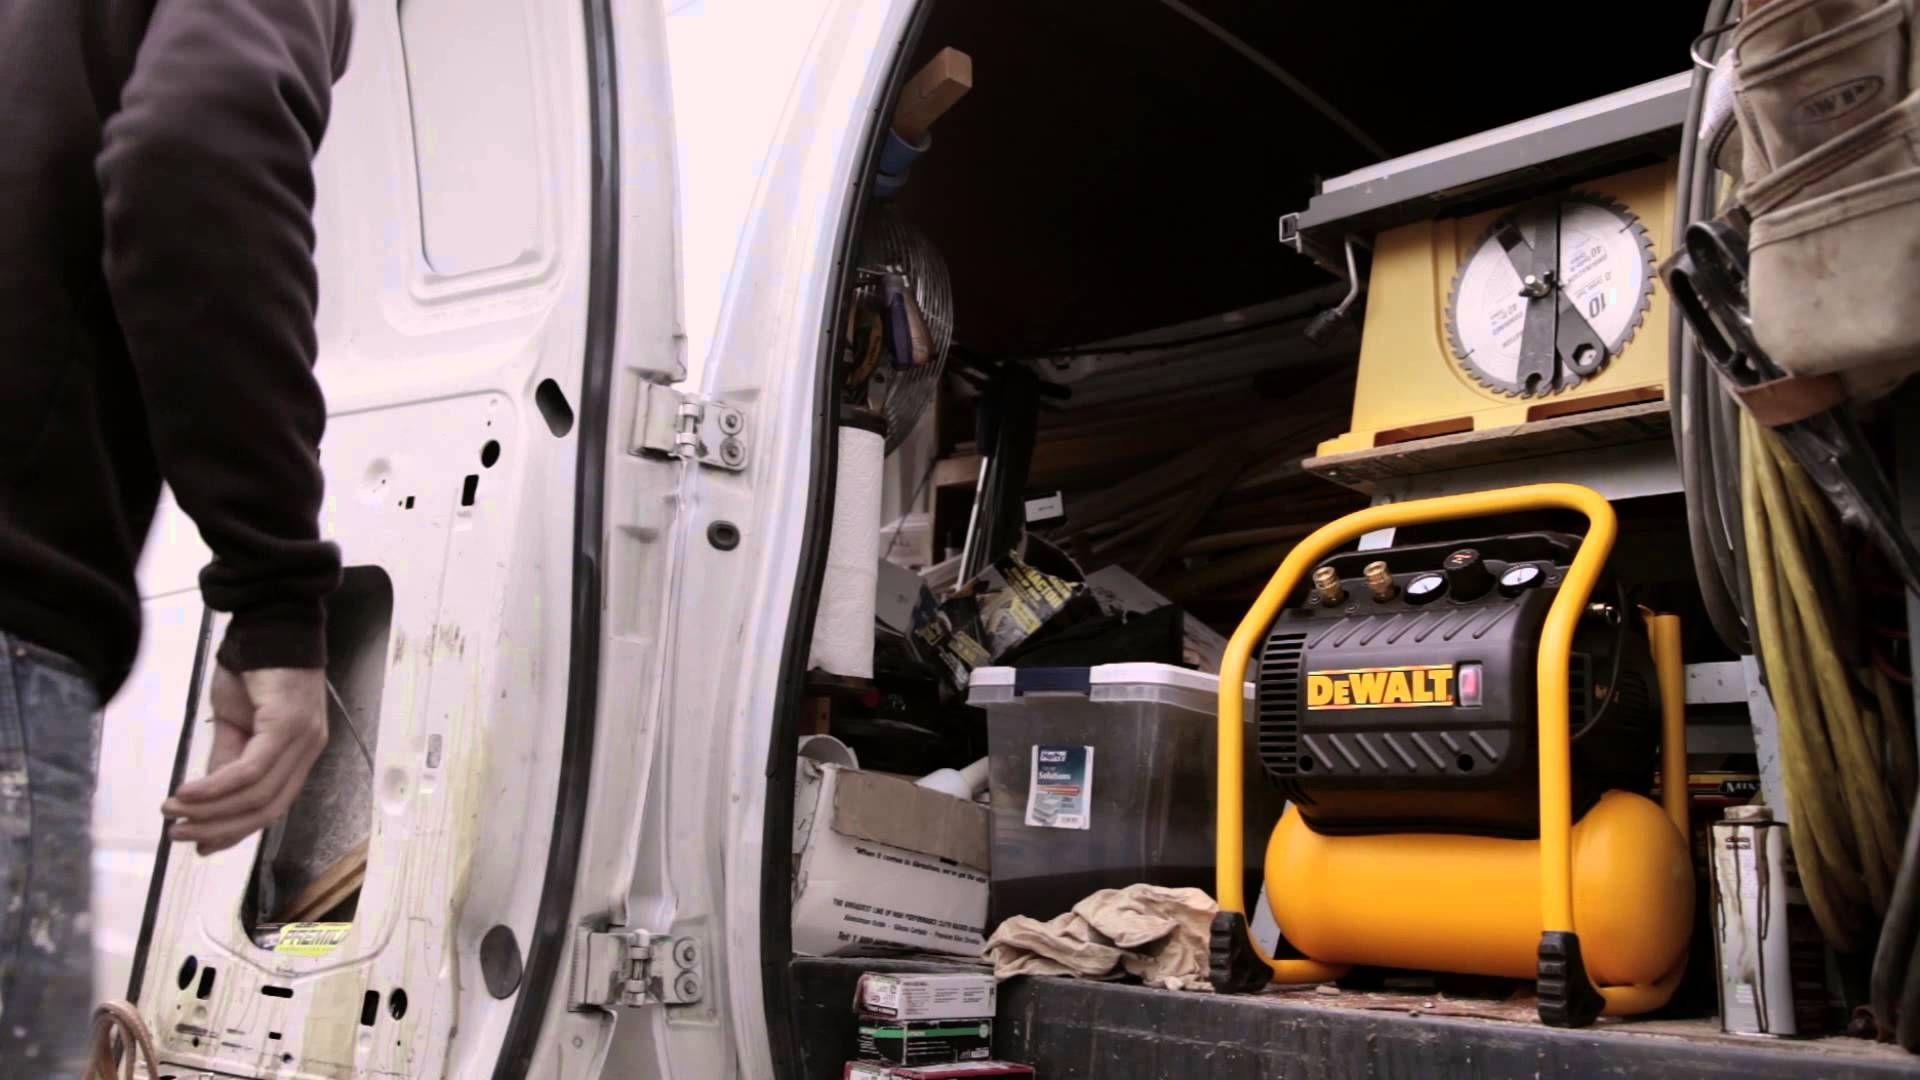 DEWALT Heavy Duty Quiet Trim Compressor